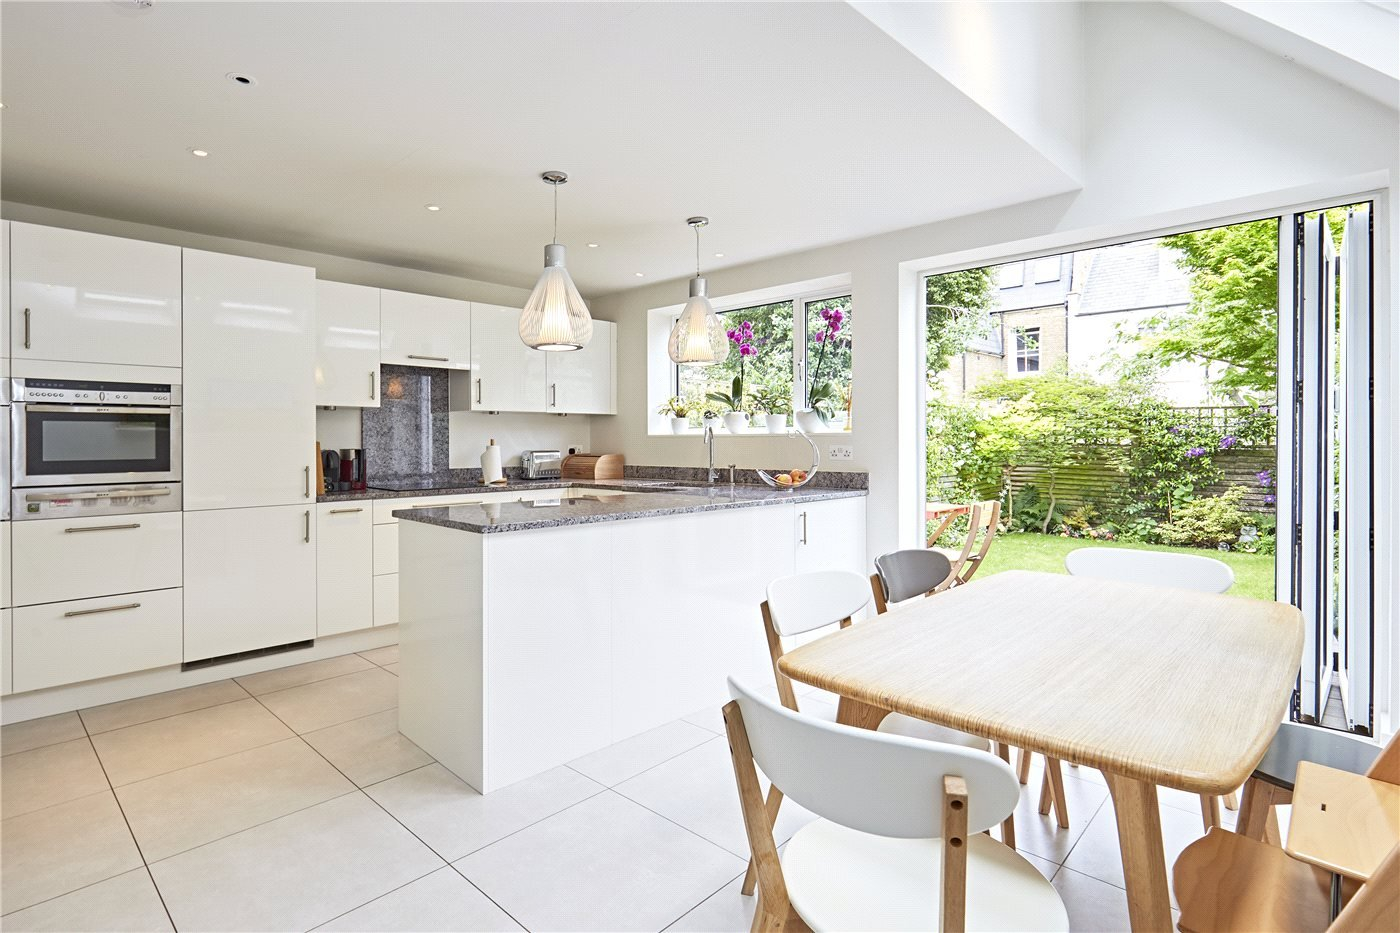 5 bedroom property for sale in Amerland Road, London, SW18 - £1,320,000